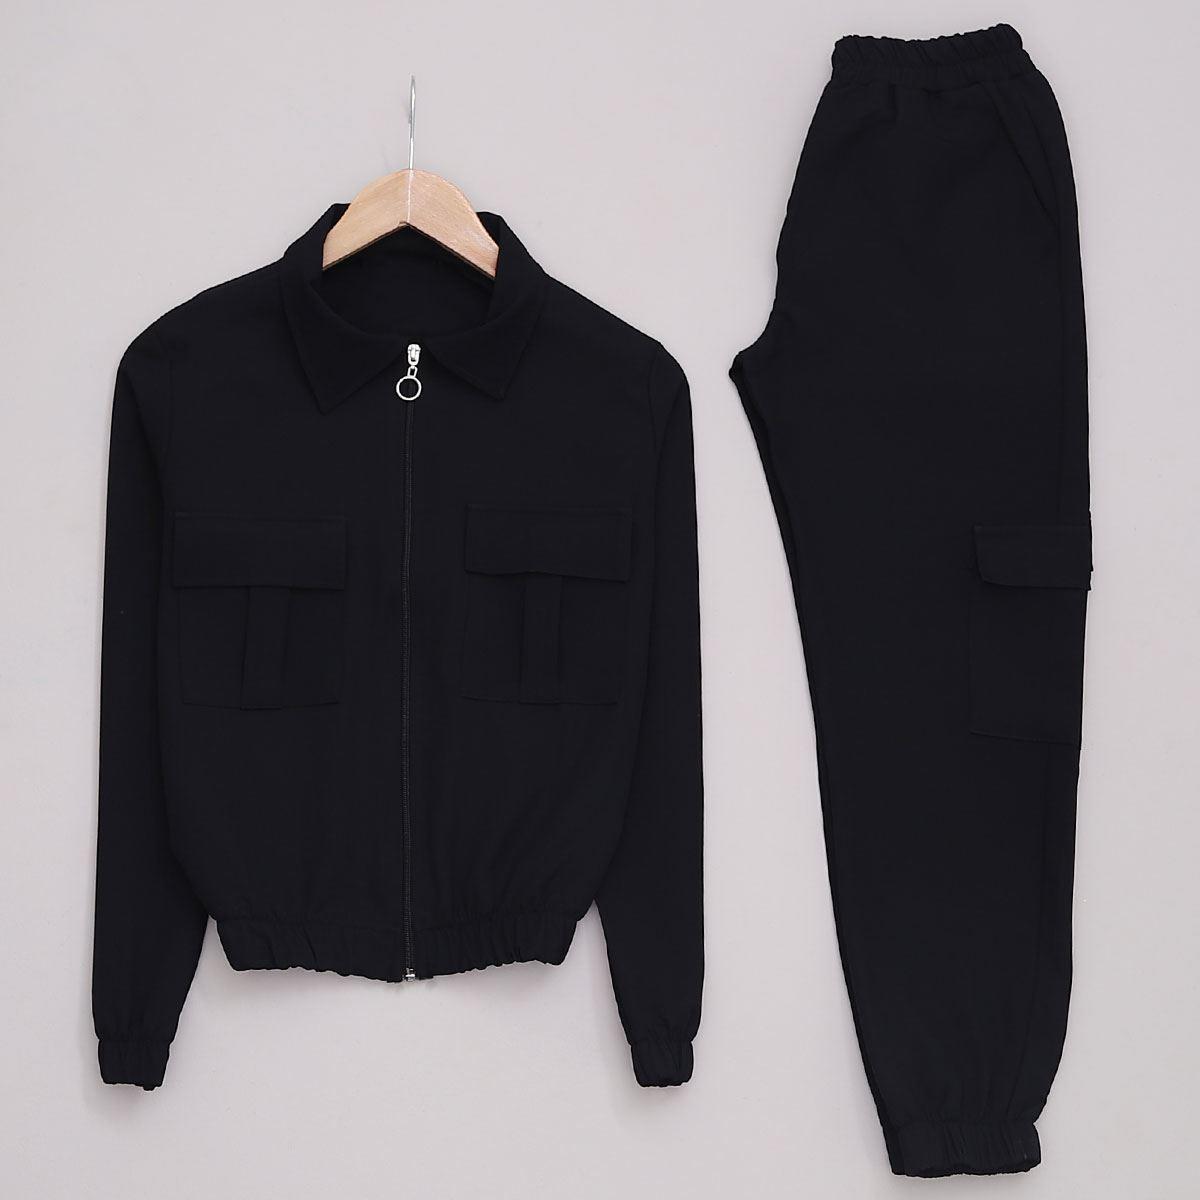 Siyah Cepli Takım TKM913